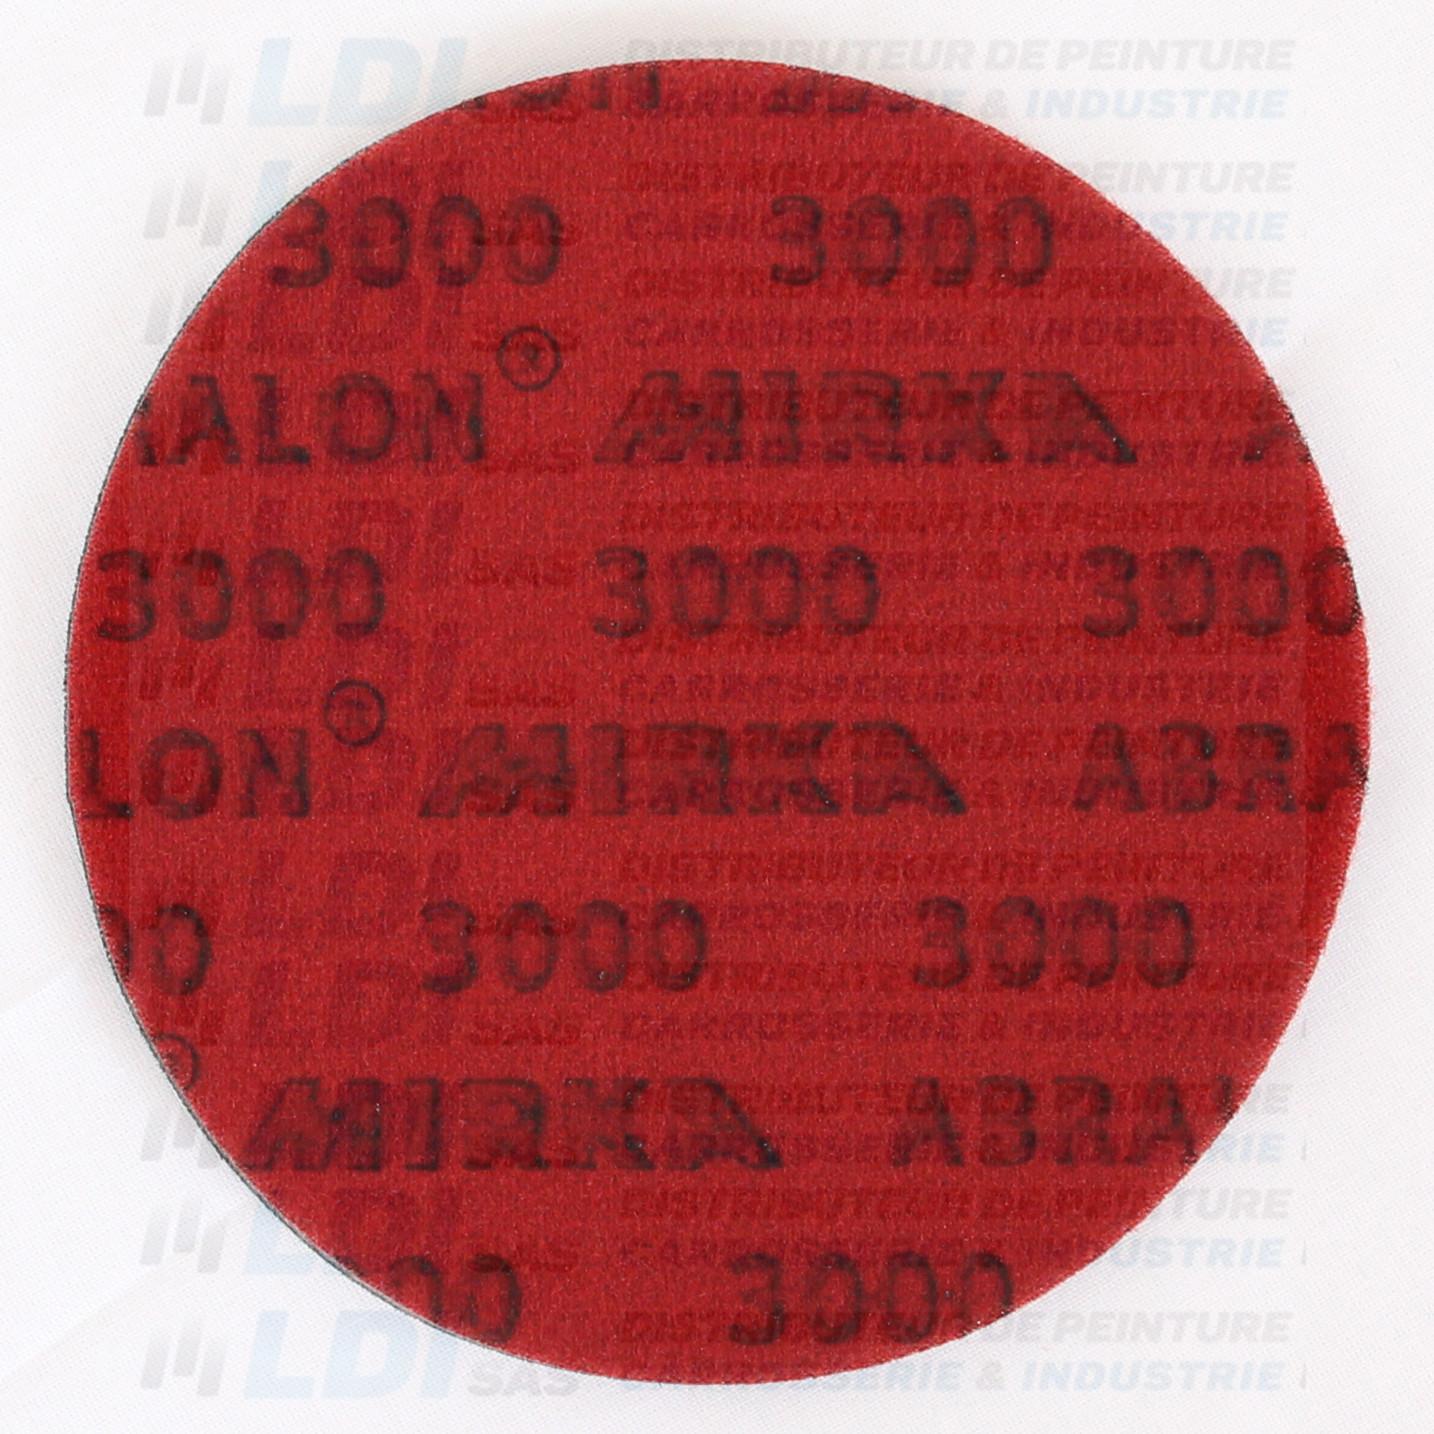 DISQUE ABRALON D150 P3000 X 20